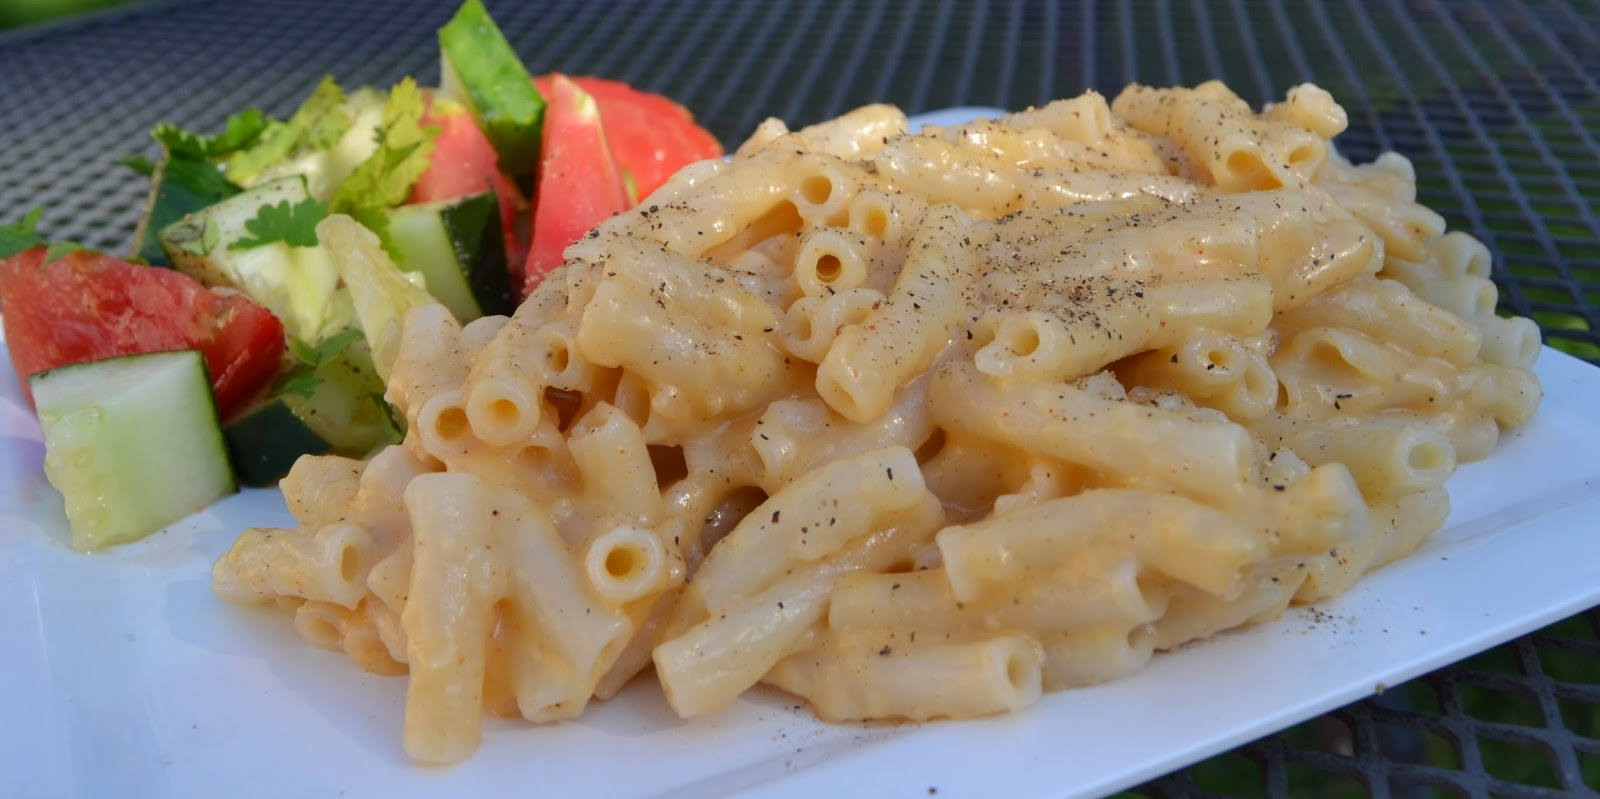 Healthy Kefir Mac and Cheese